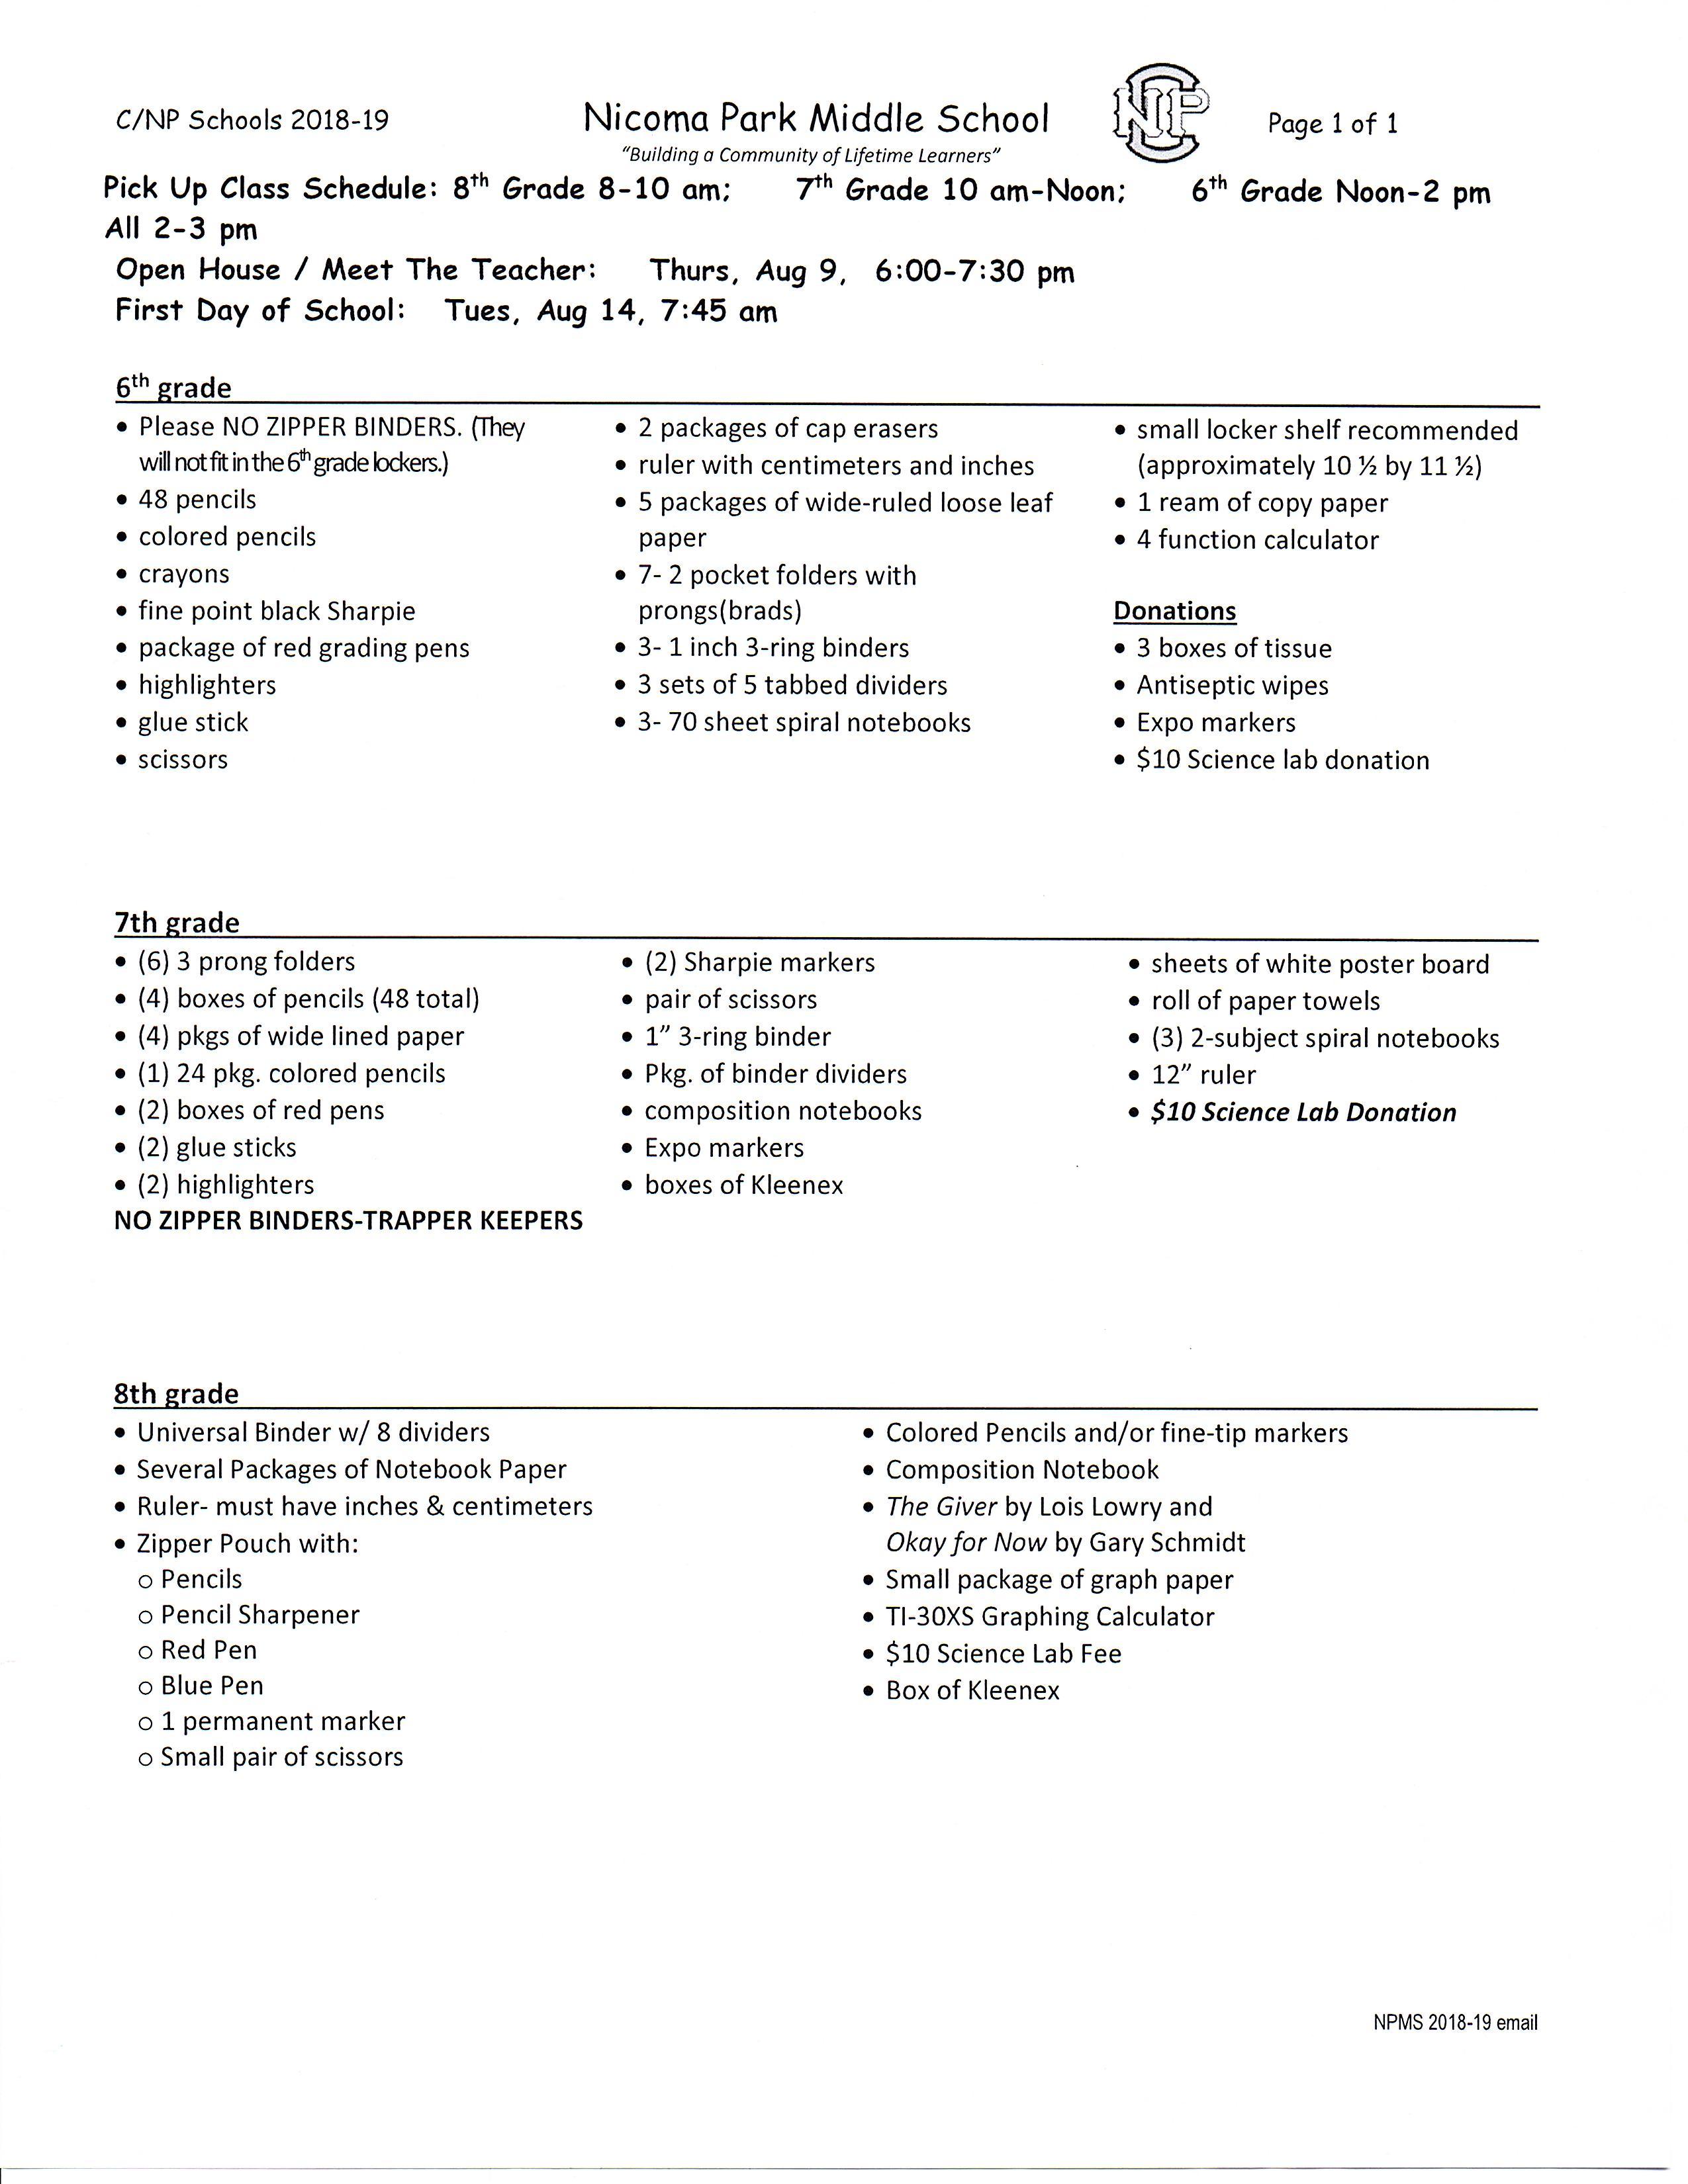 Middle School 7Th Grade School Supply List  School Style within Nicoma Park Middle School Calendar